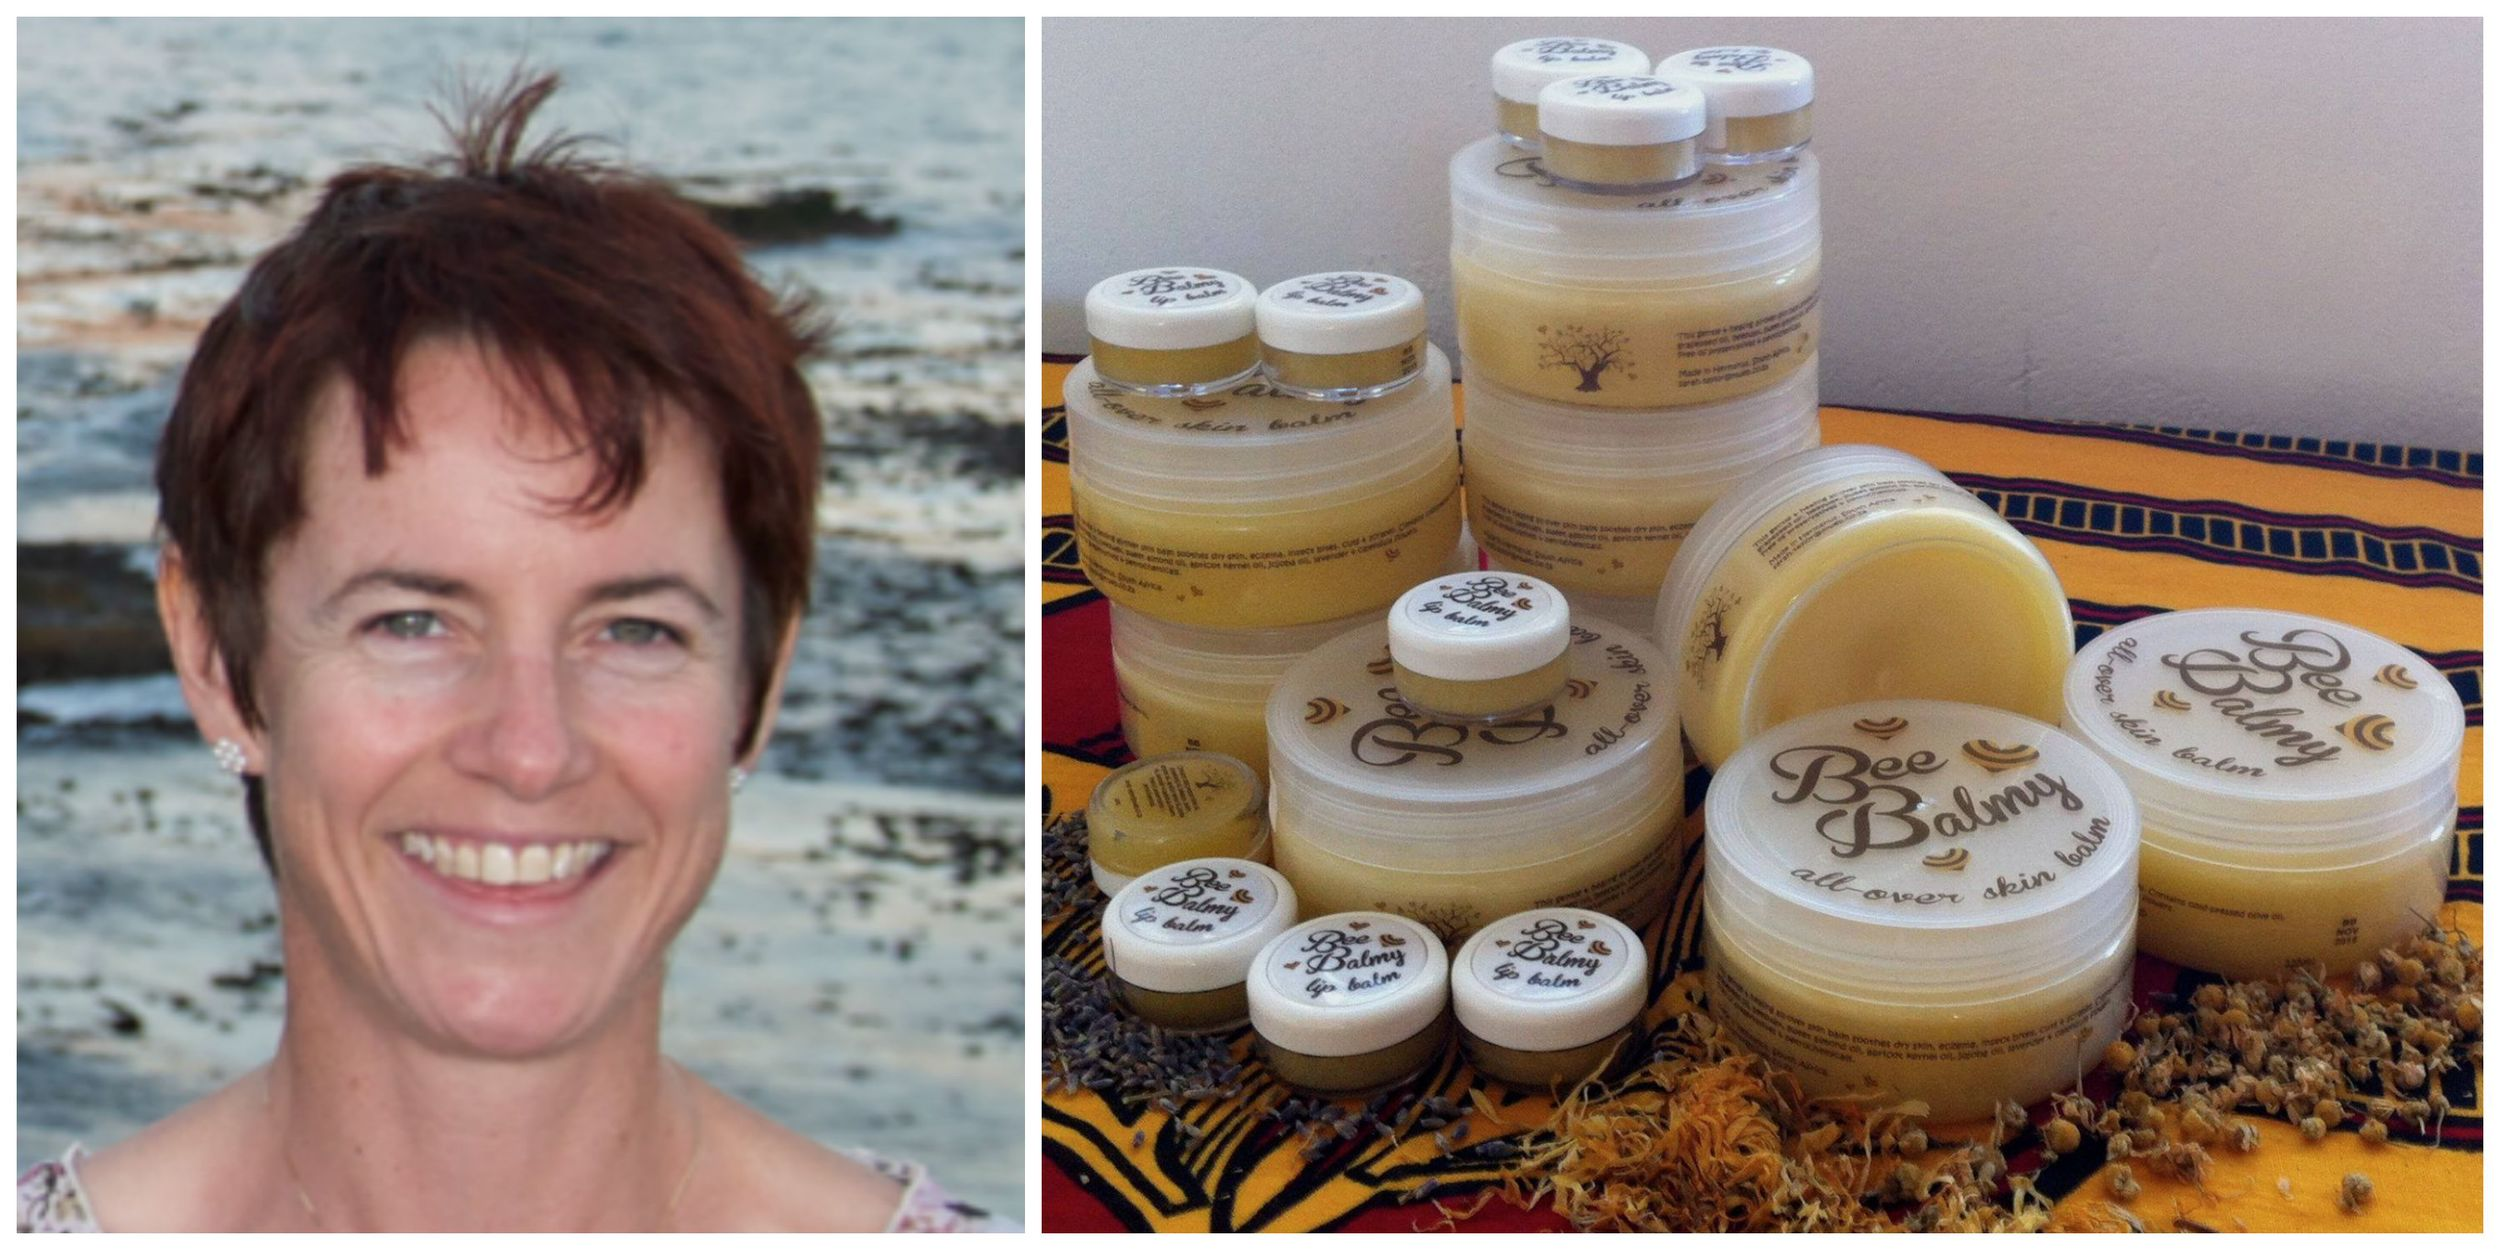 Sarah Taylor, founder of Bee Balmy